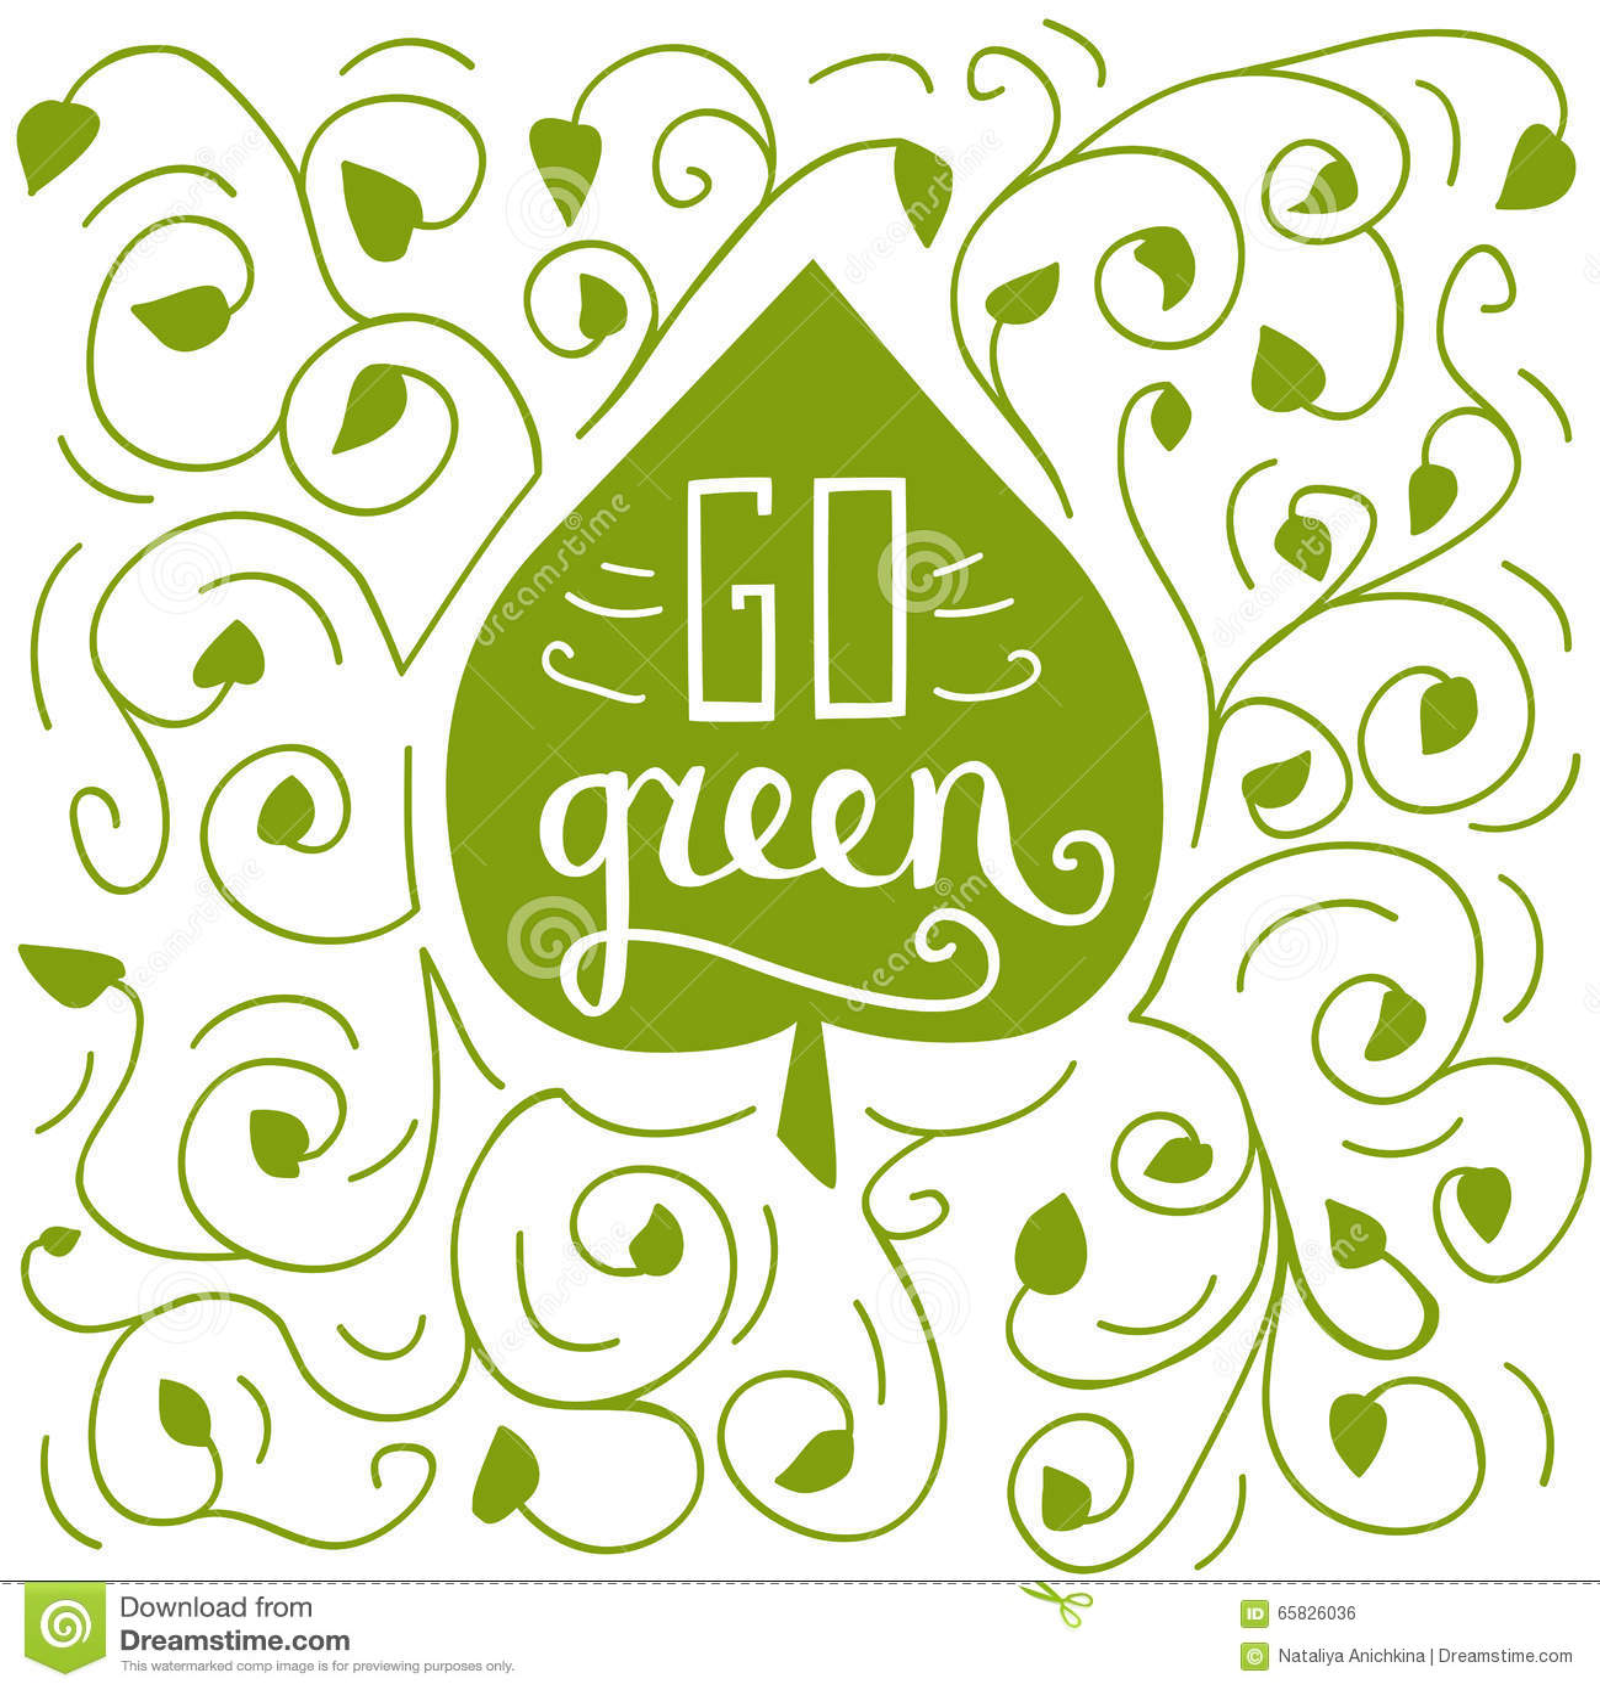 Go Green Doodle Illustration Stock Vector Illustration Of Health